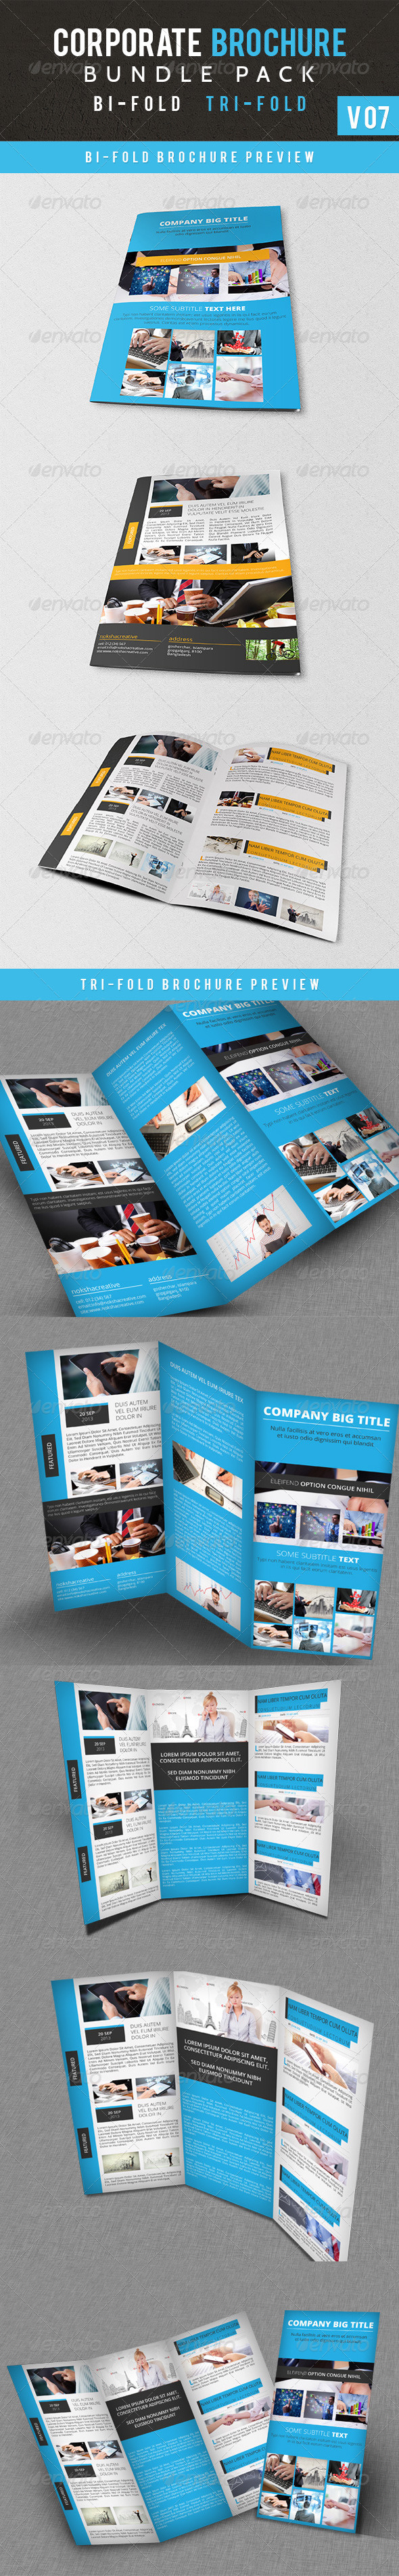 Corporate Brochure Bundle Pack V 07 - Brochures Print Templates